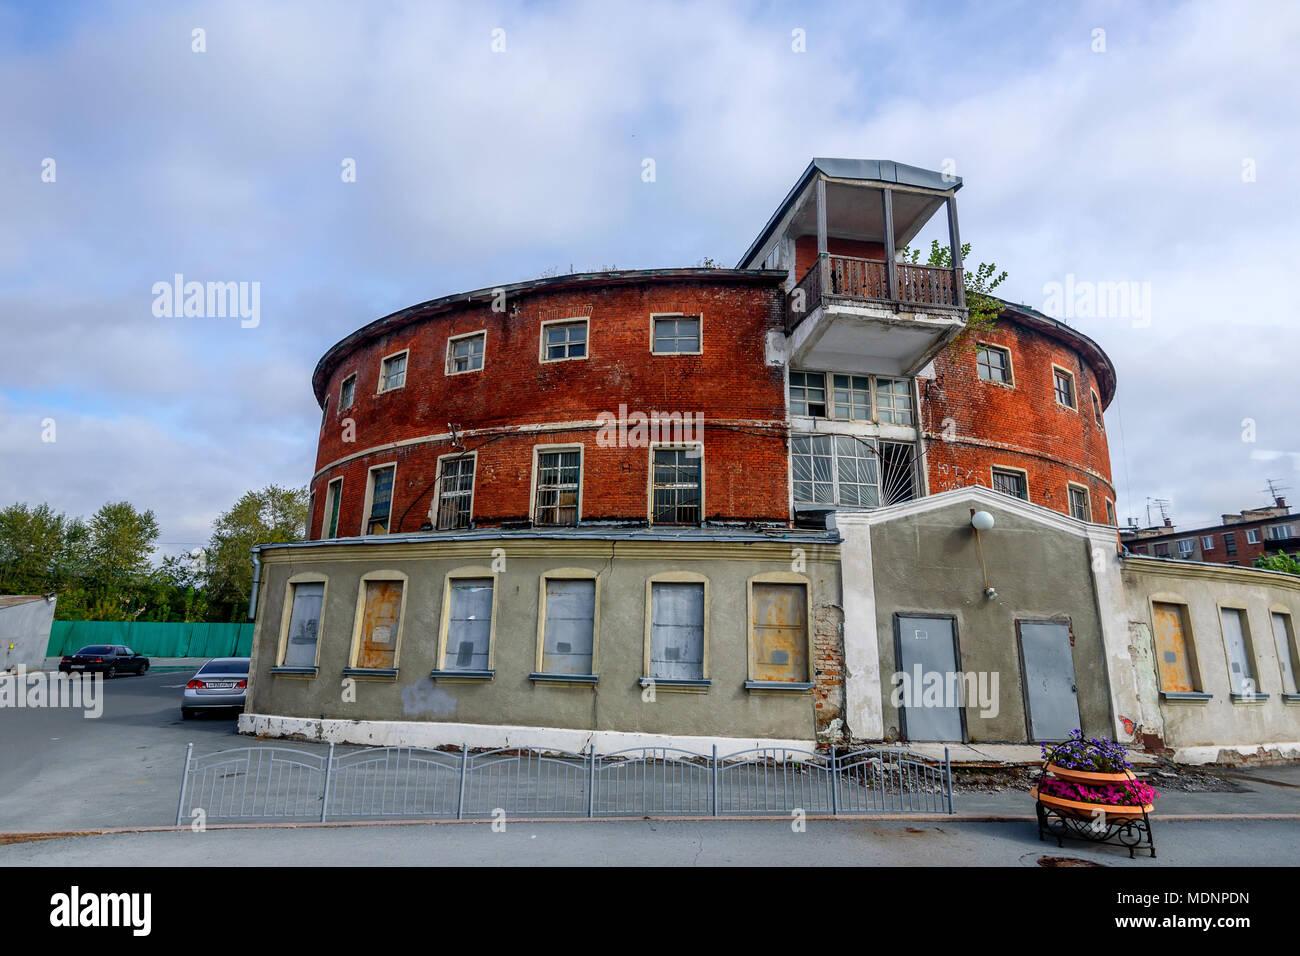 TYUMEN, RUSSIA - SEPTEMBER 9, 2016: Round building of city bath, Tyumen, Russia - Stock Image